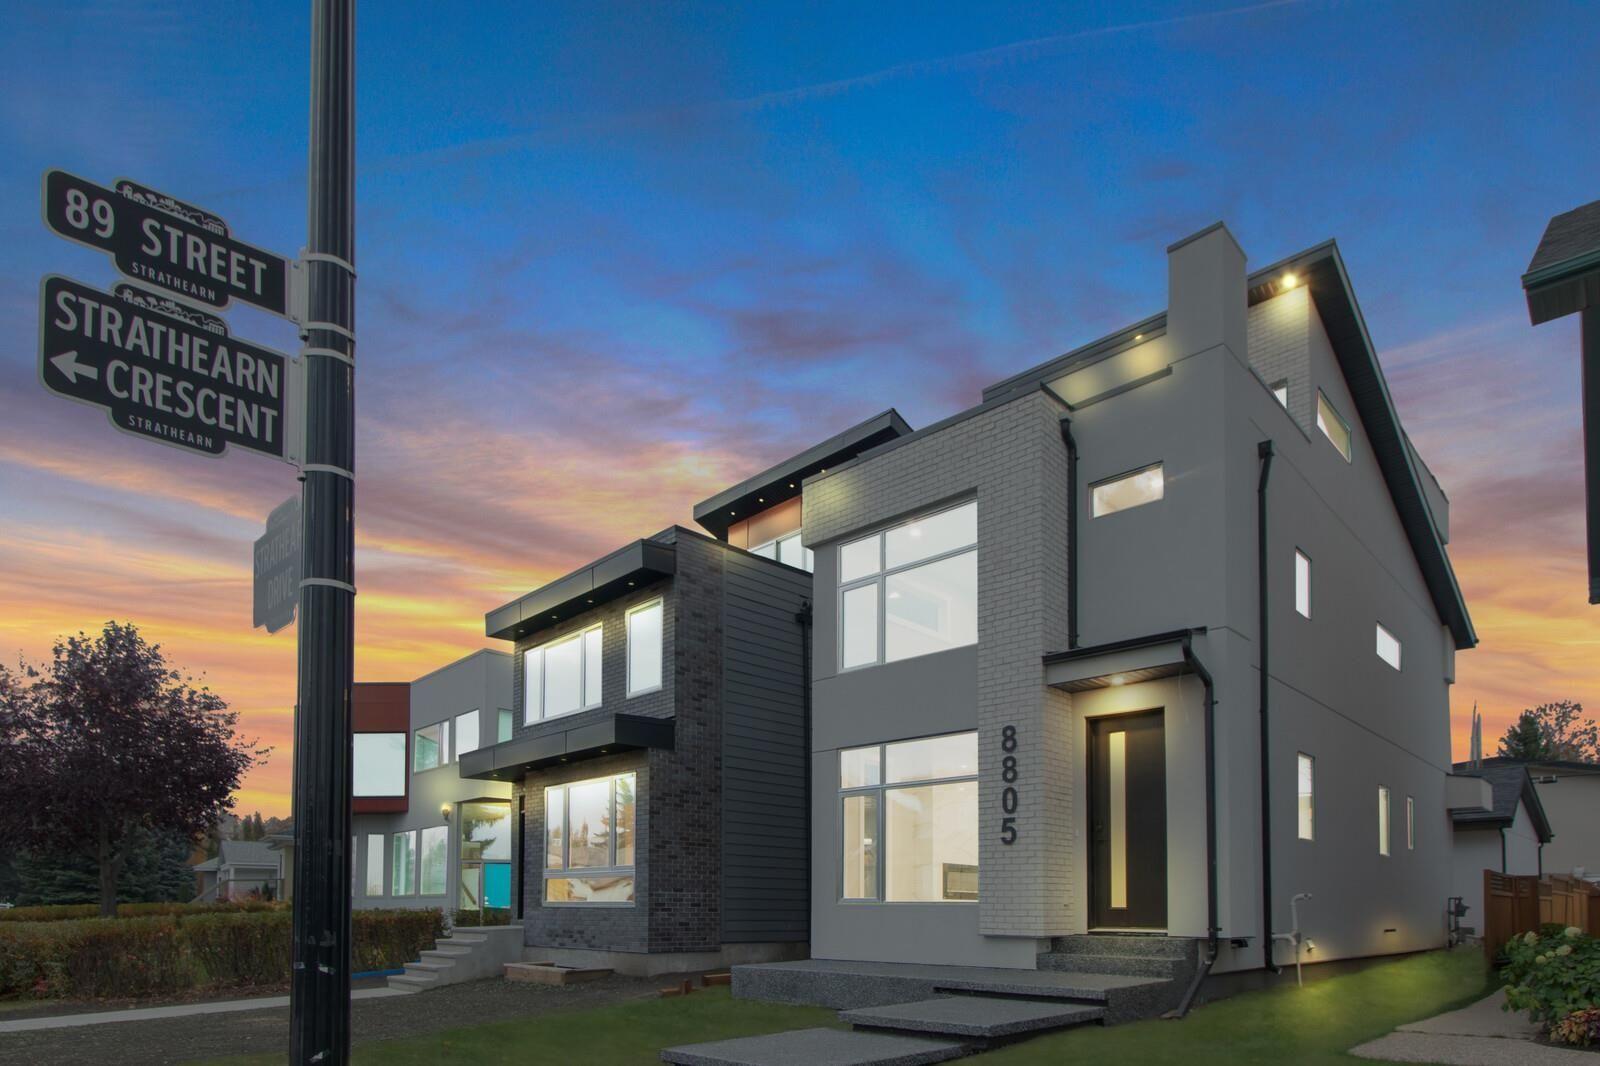 Main Photo: 8805 STRATHEARN Drive in Edmonton: Zone 18 House for sale : MLS®# E4266005